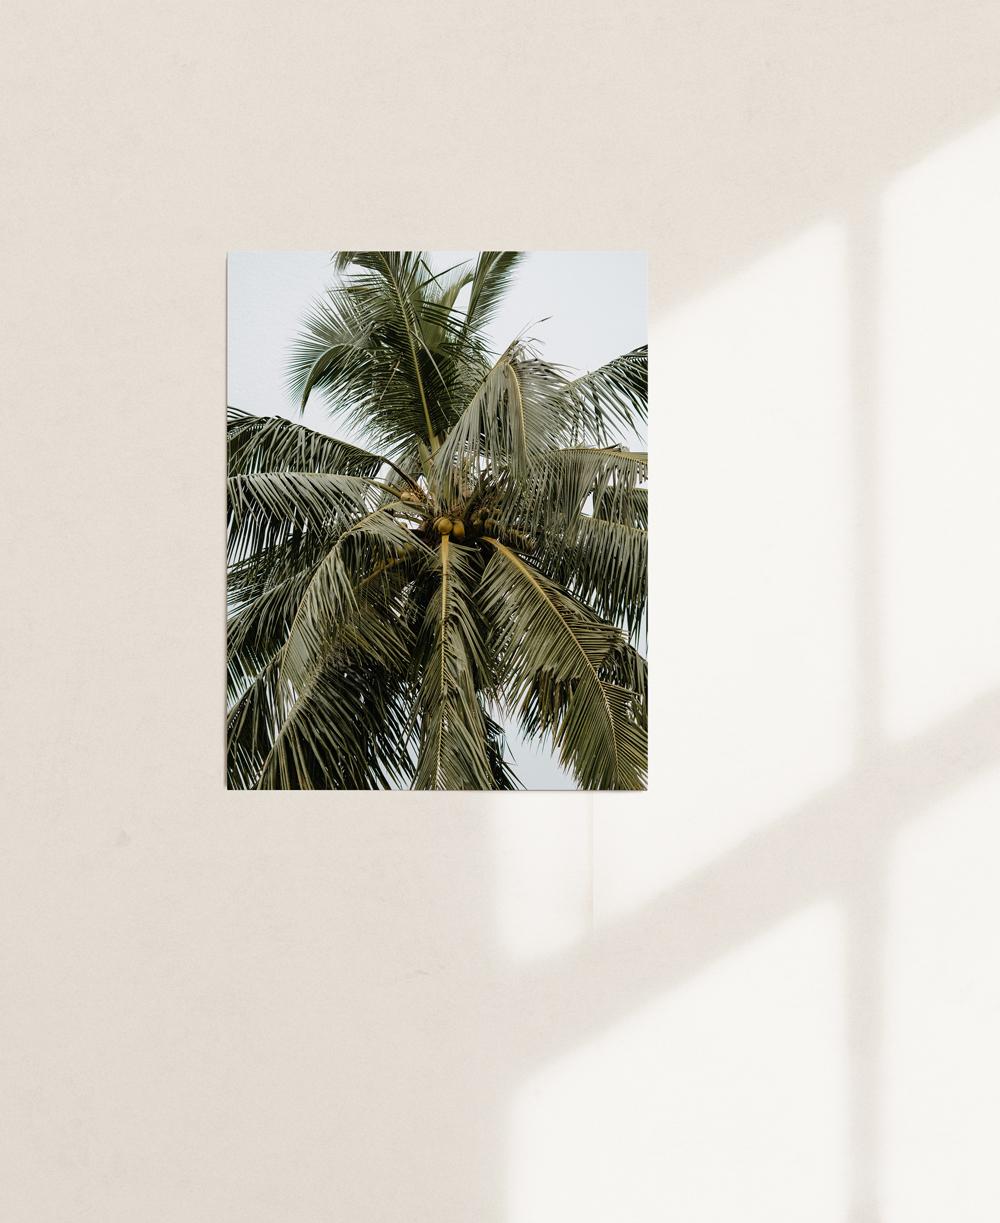 nicischwab-prints-02-013